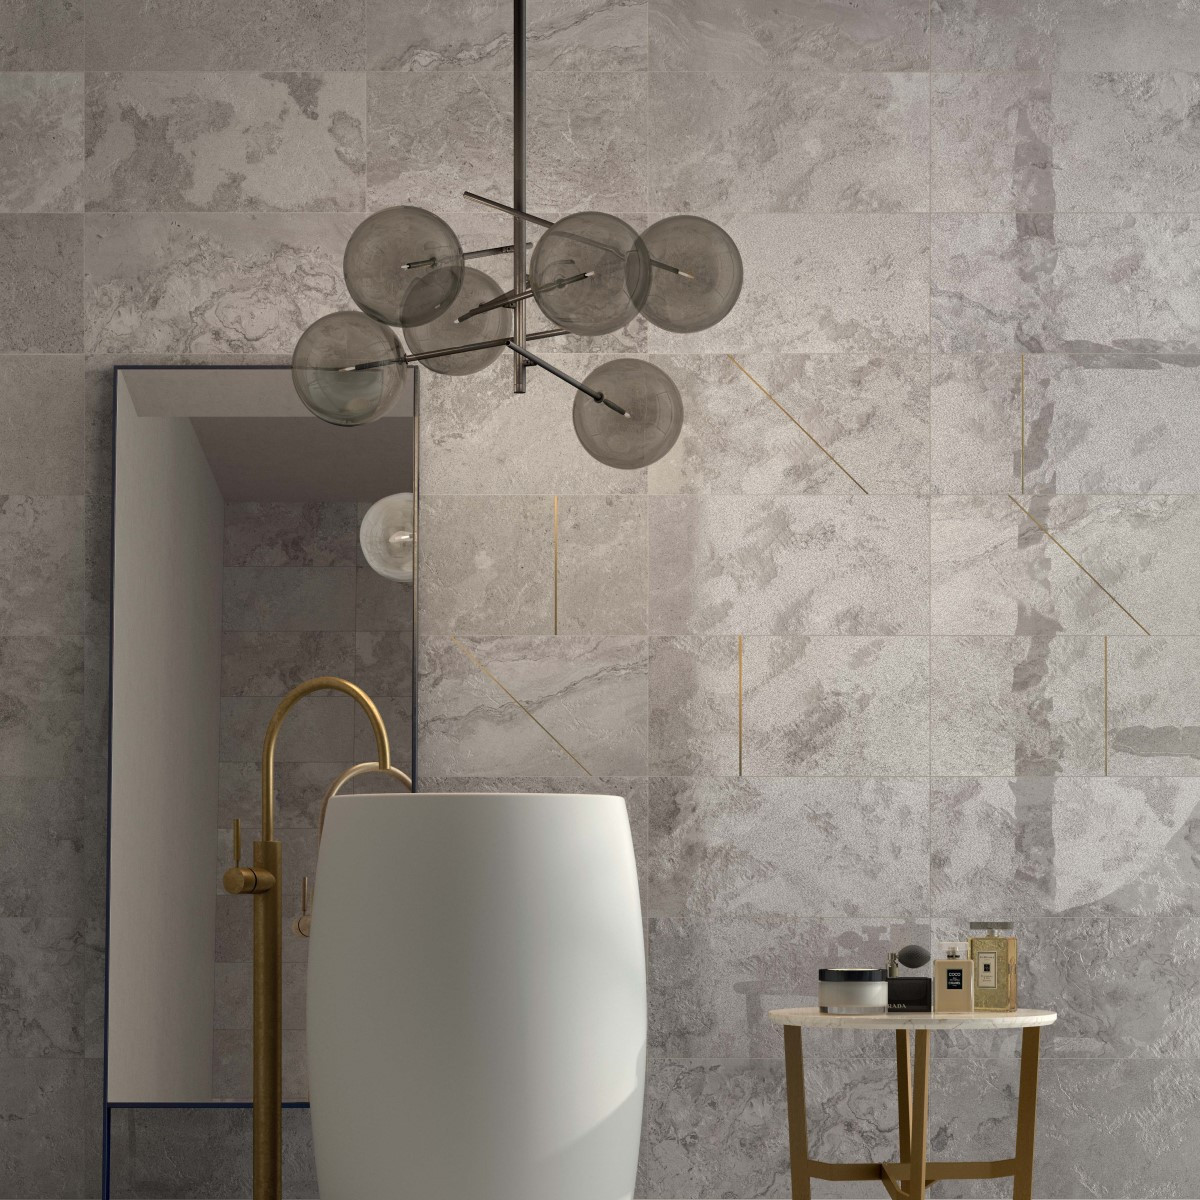 Alpes raw Grey lapp. 30x60 + Alpes dec. Sign Grey mix 2 lapp. 30x60 Italian Grey Porcelain Bathroom Wall and Floor Tile